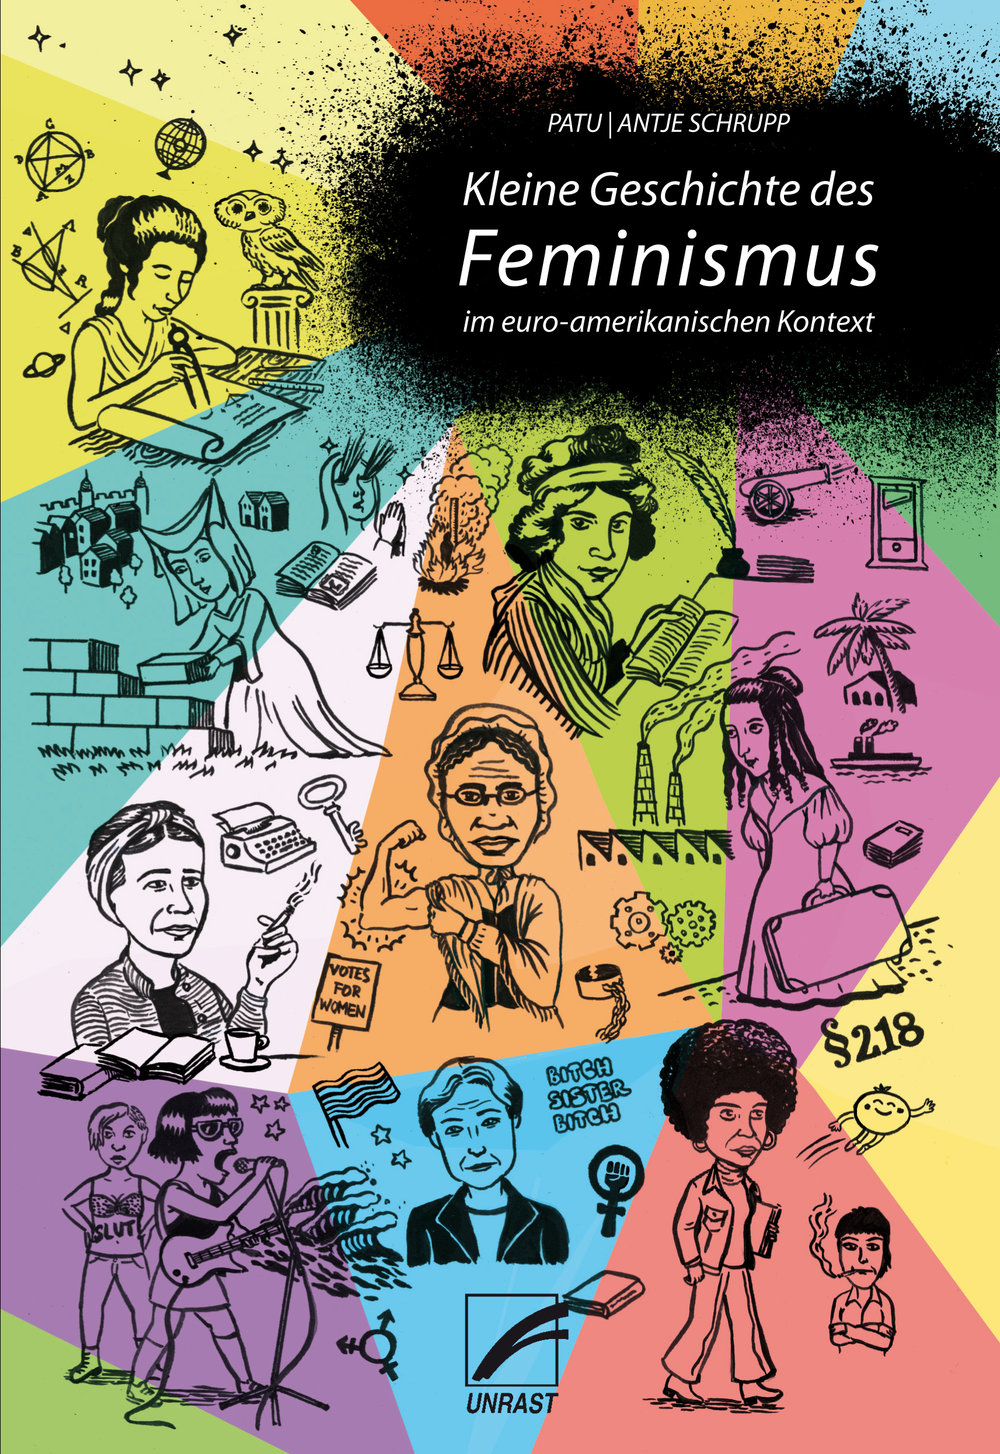 feminismuscomic_werbungbild_cover.jpg